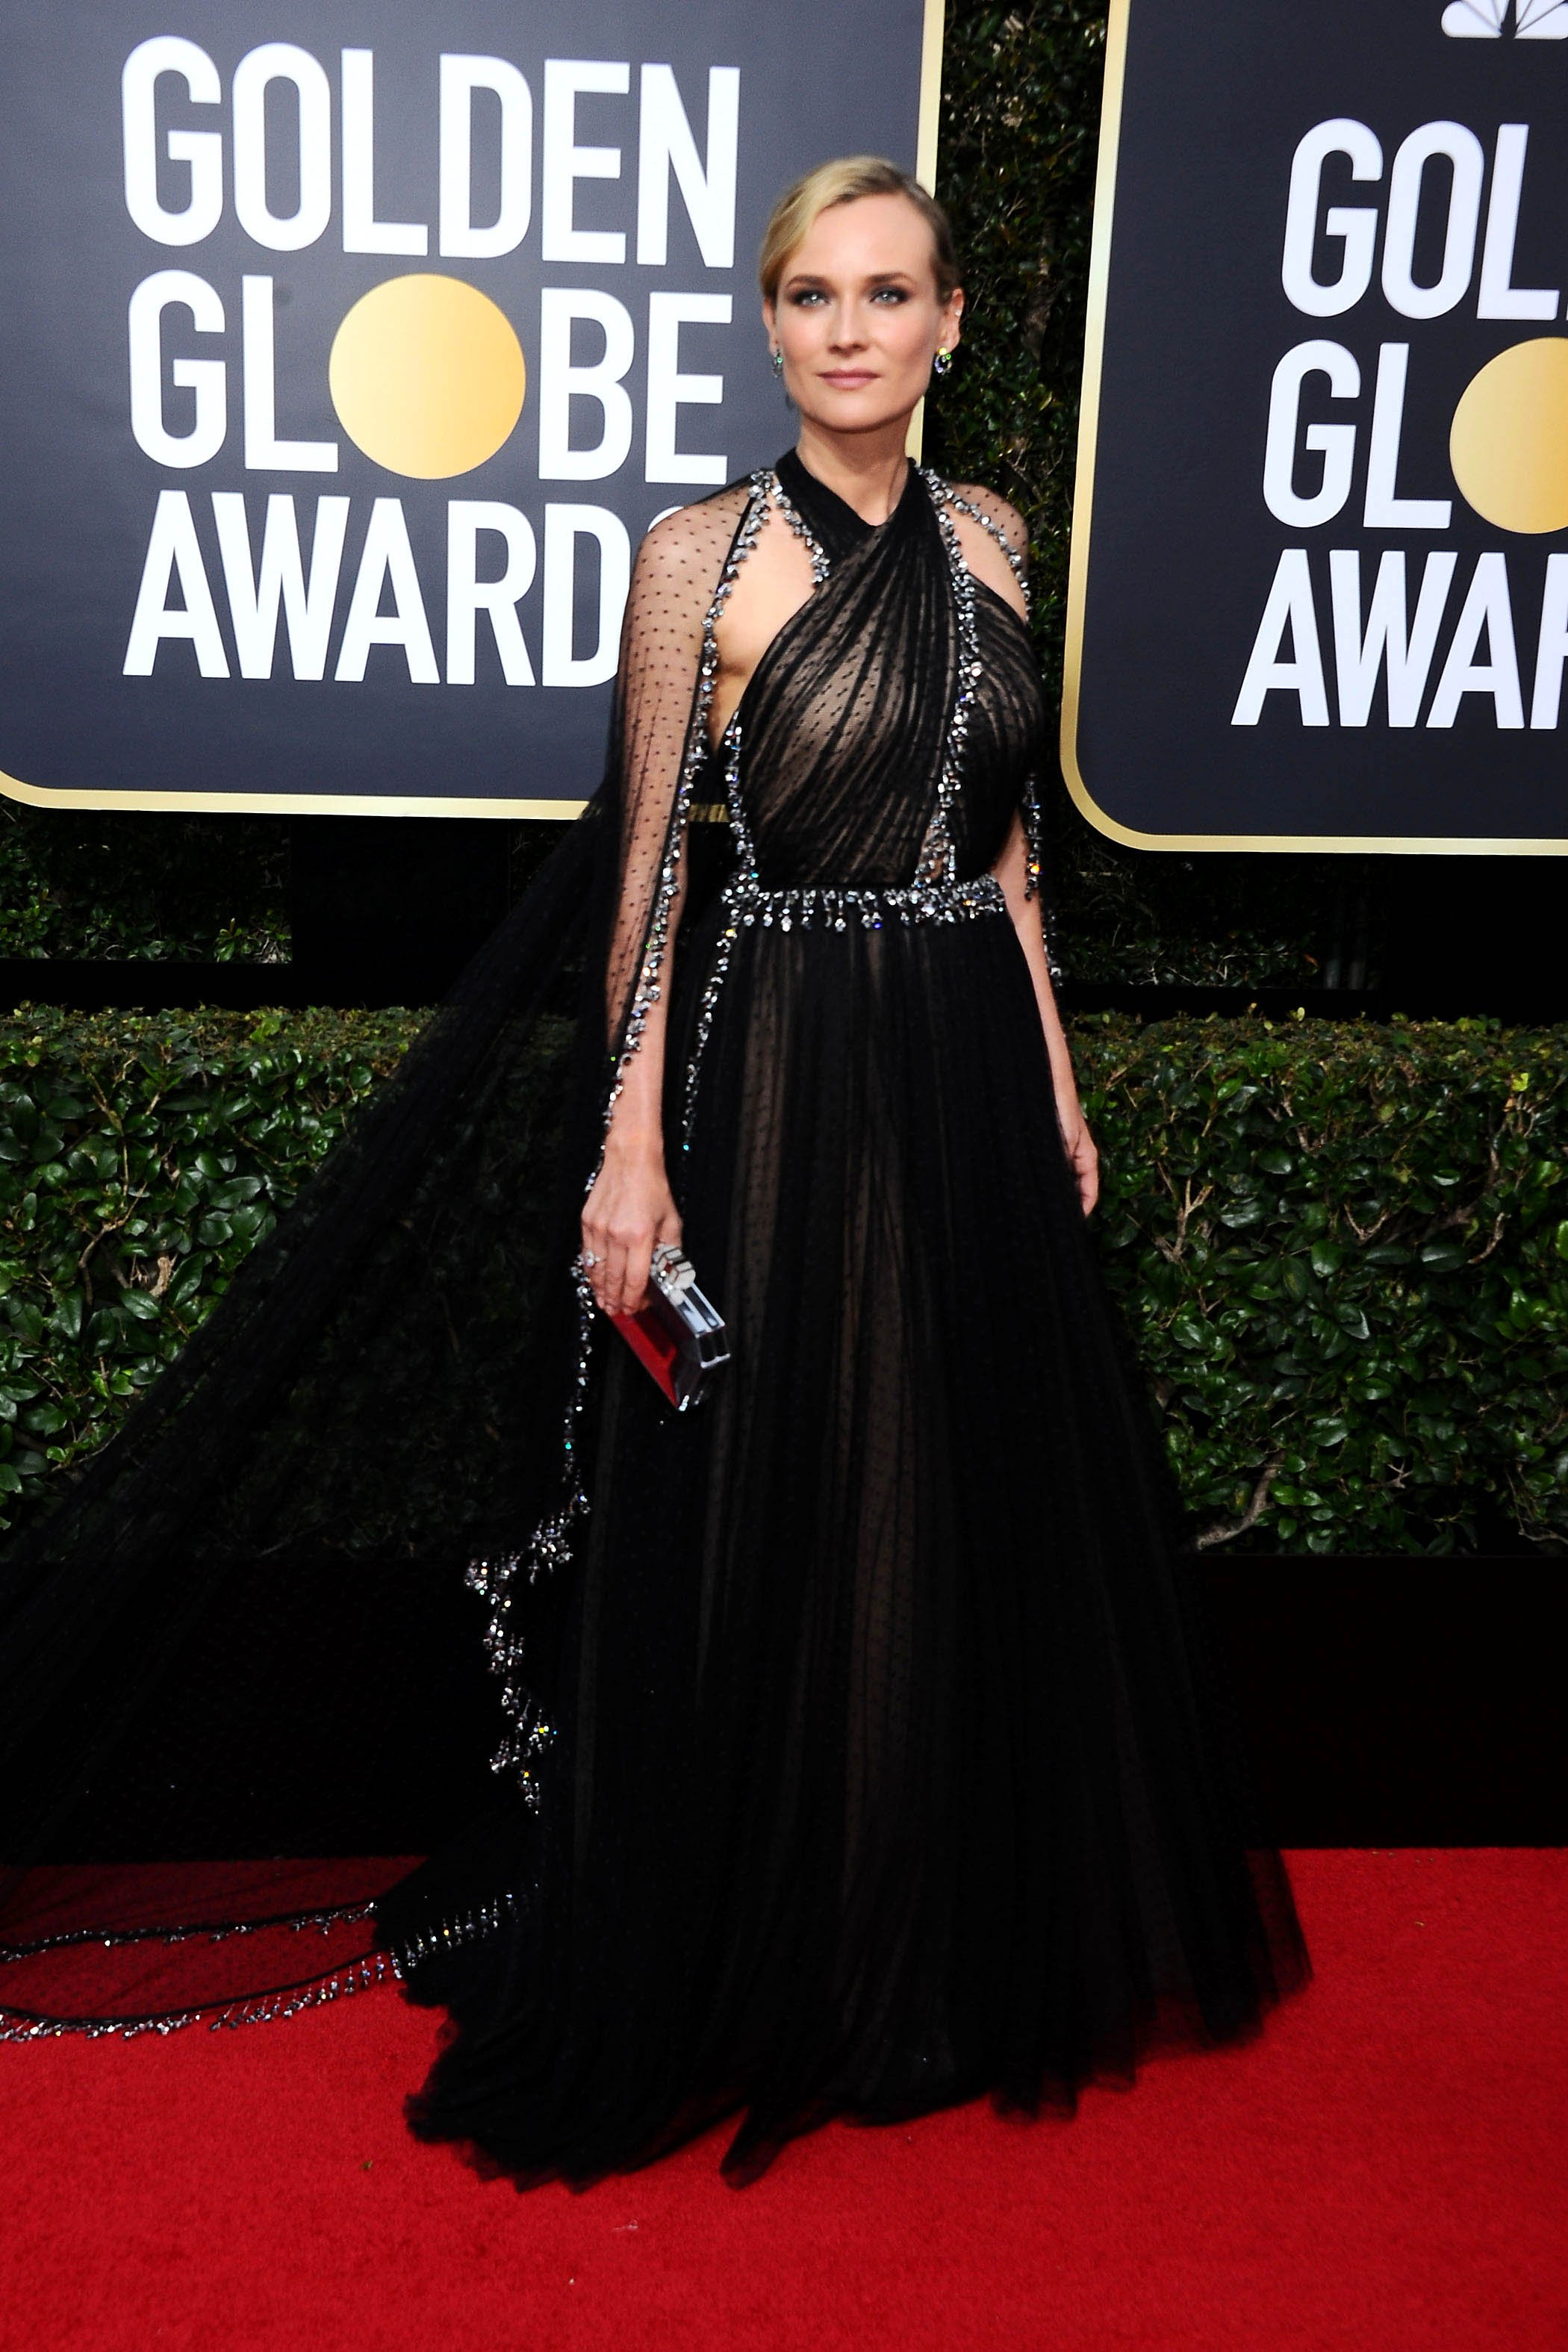 , Beverly Hills, CA -20180107 - The 75th Golden Globe Awards - Arrivals at The Beverly Hilton  -PICTURED: Diane Kruger -, Image: 359496153, License: Rights-managed, Restrictions: , Model Release: no, Credit line: Profimedia, INSTAR Images